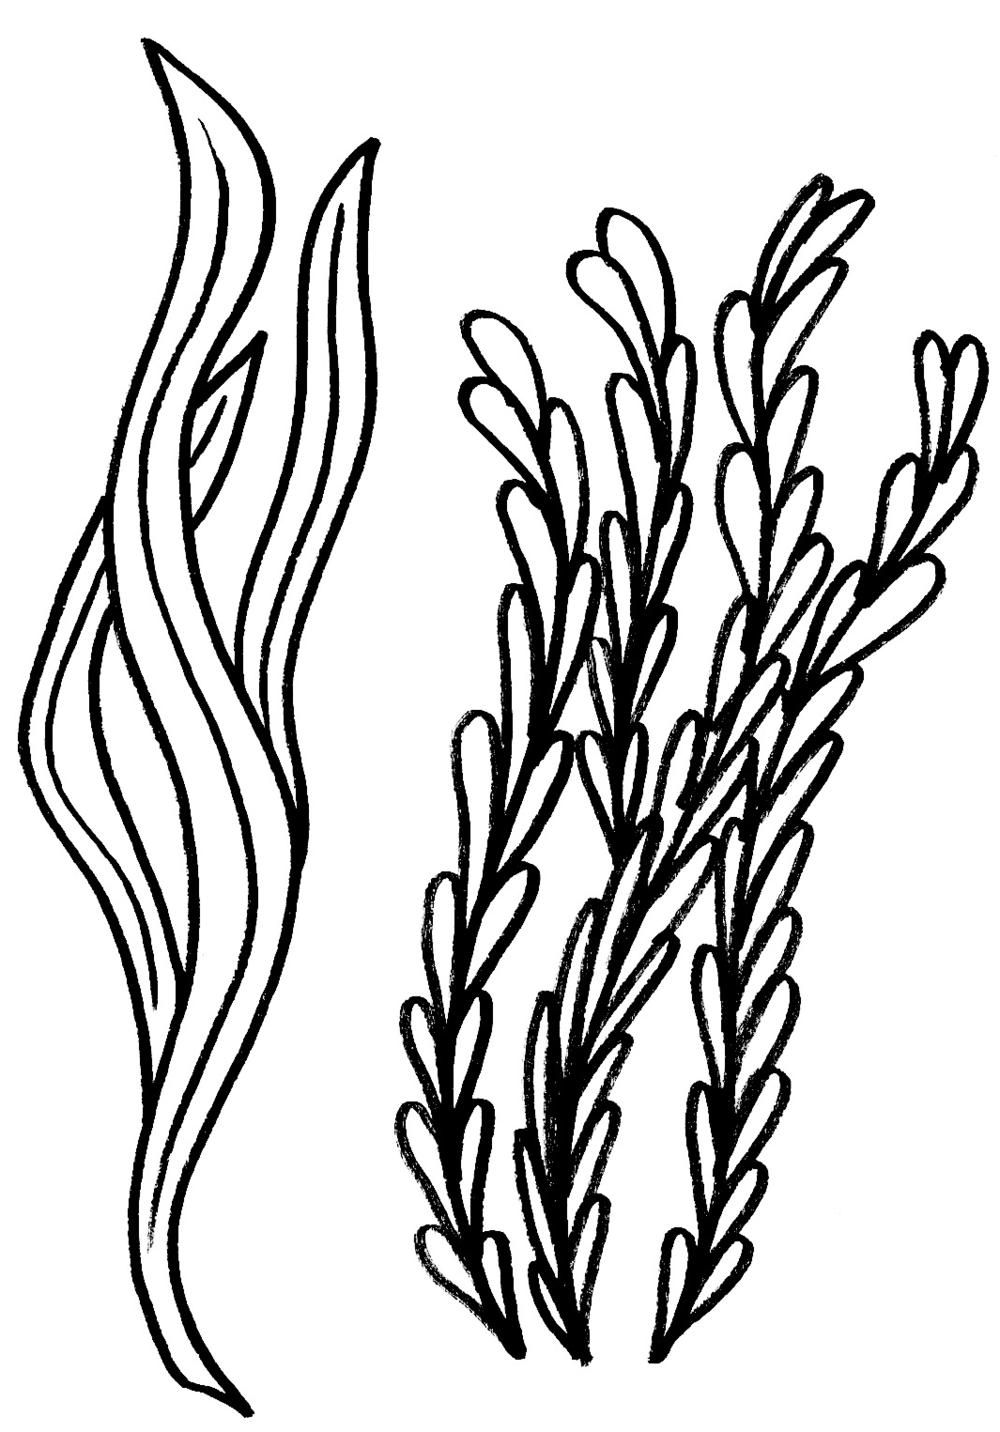 waterplantssketch.png